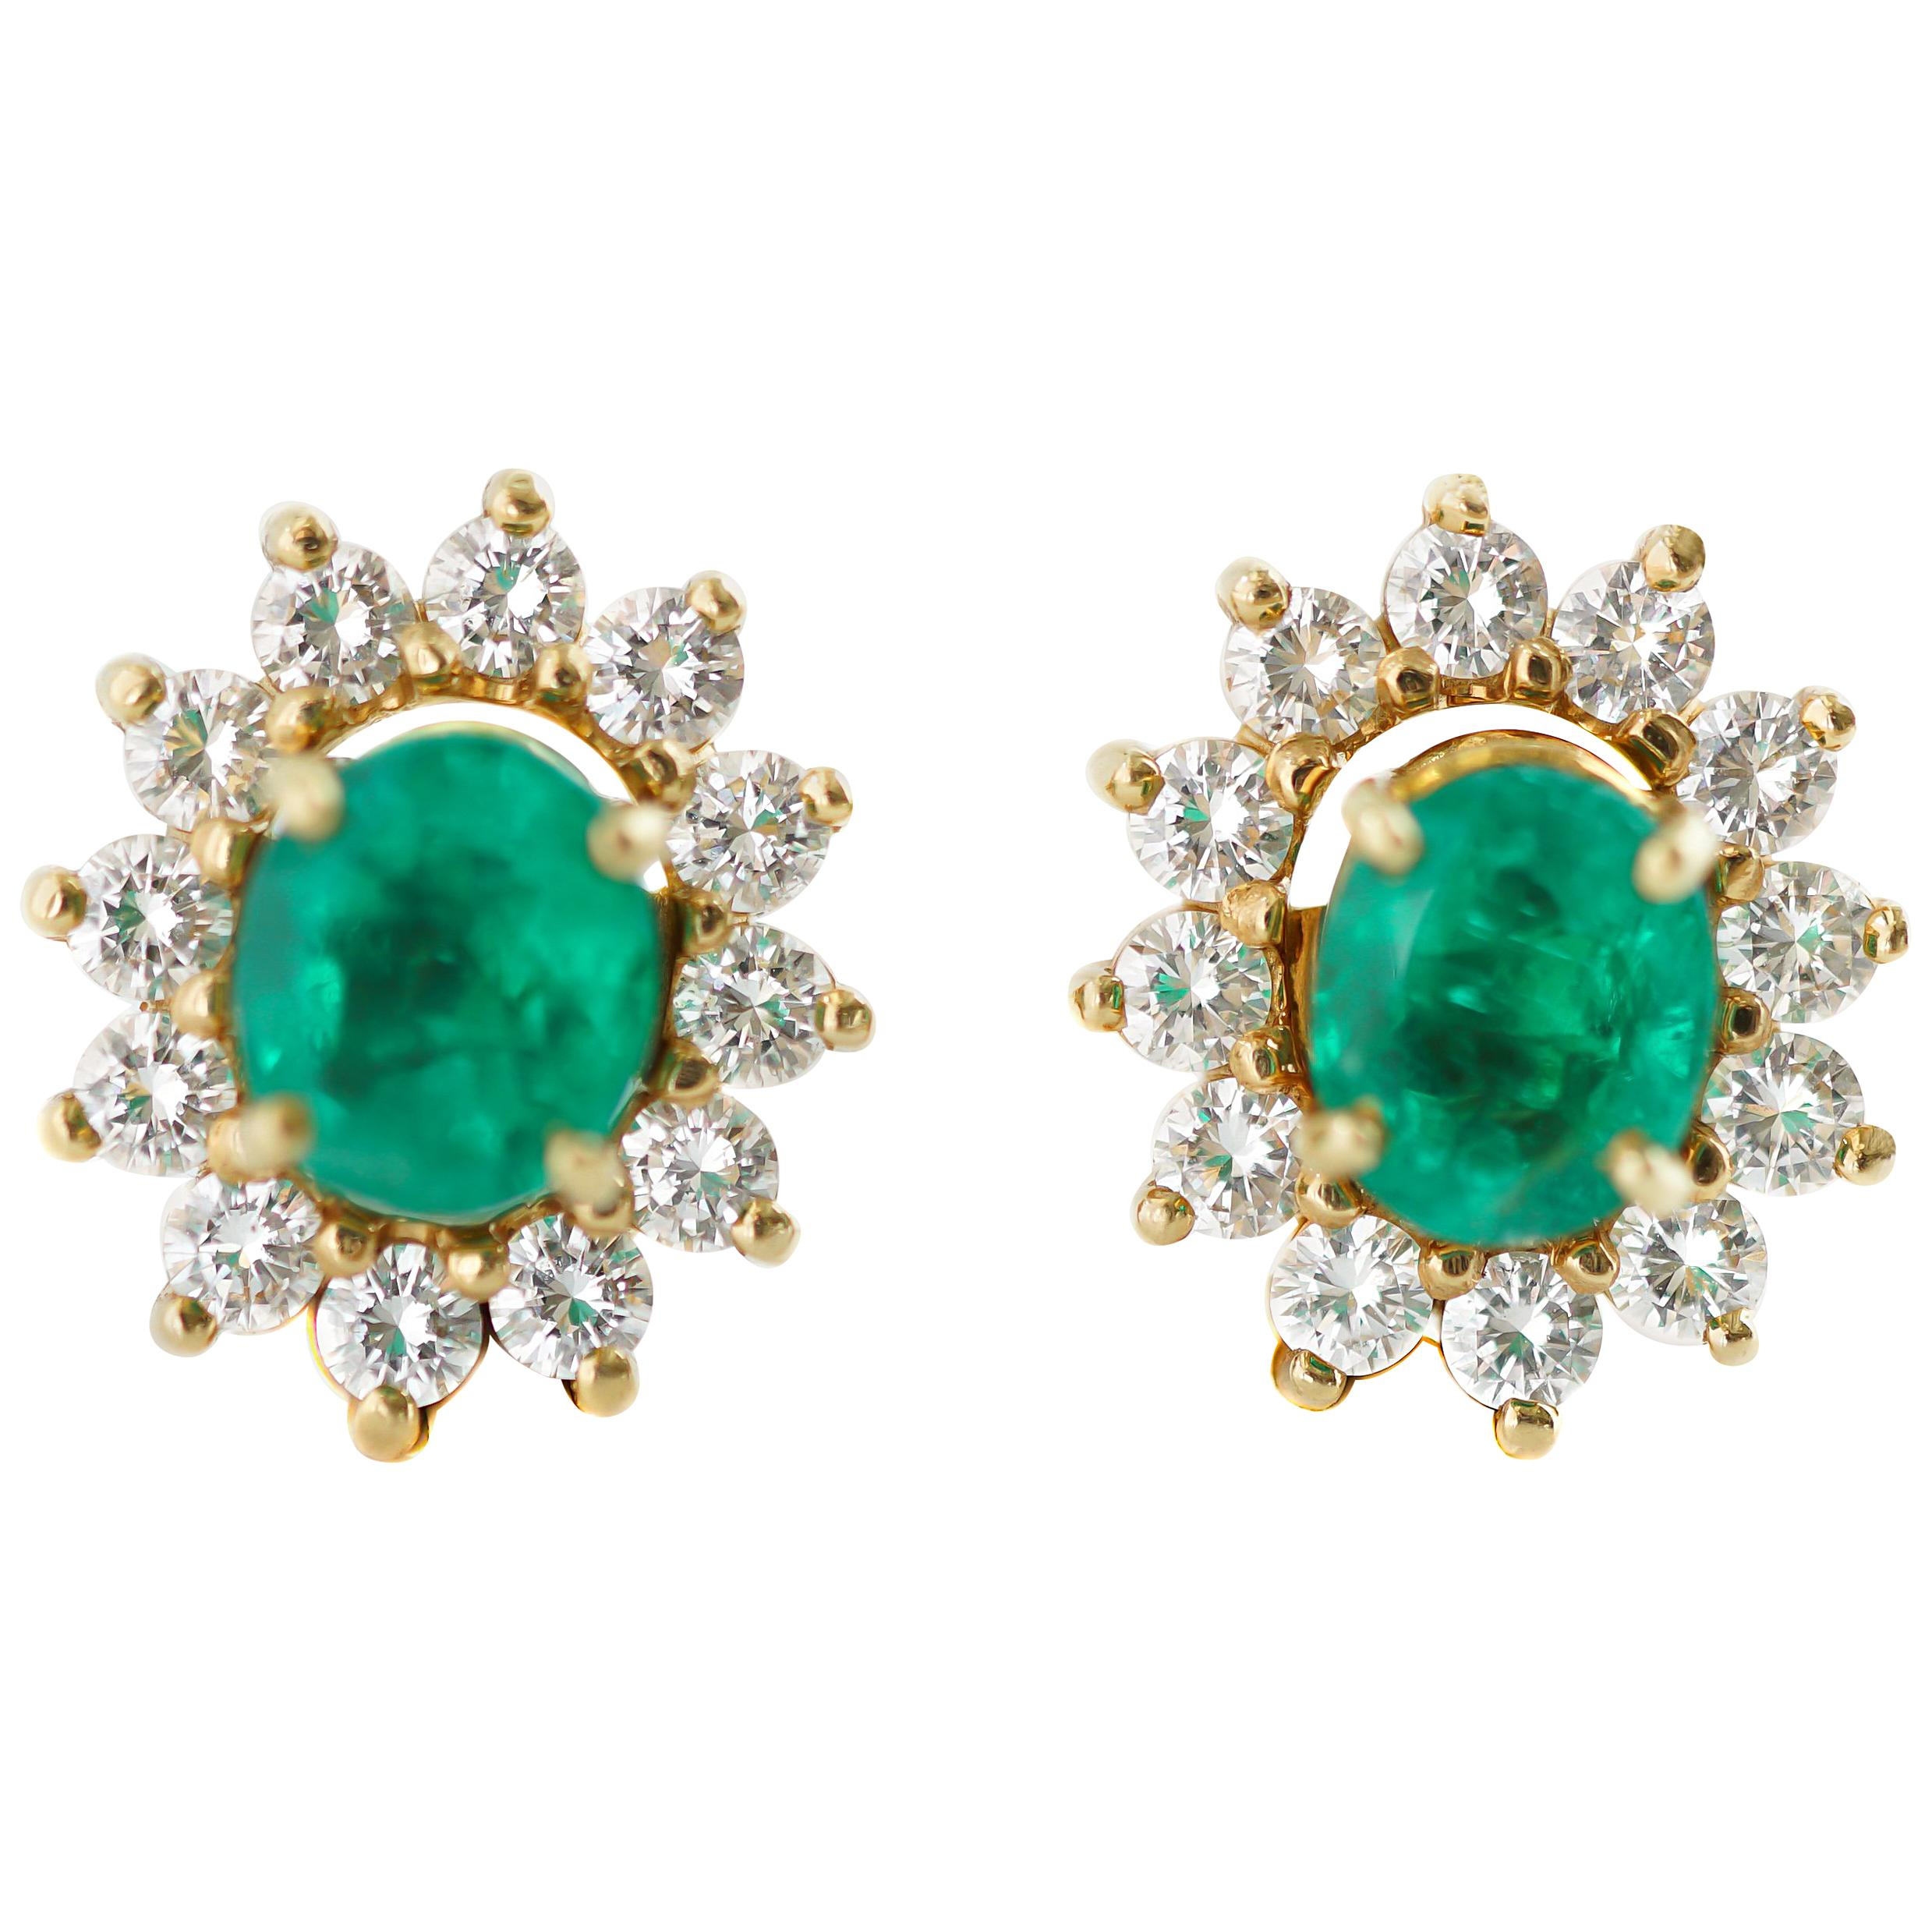 2 Carat Colombian Emerald Stud Earrings with 0.90 Carat Diamond Jackets